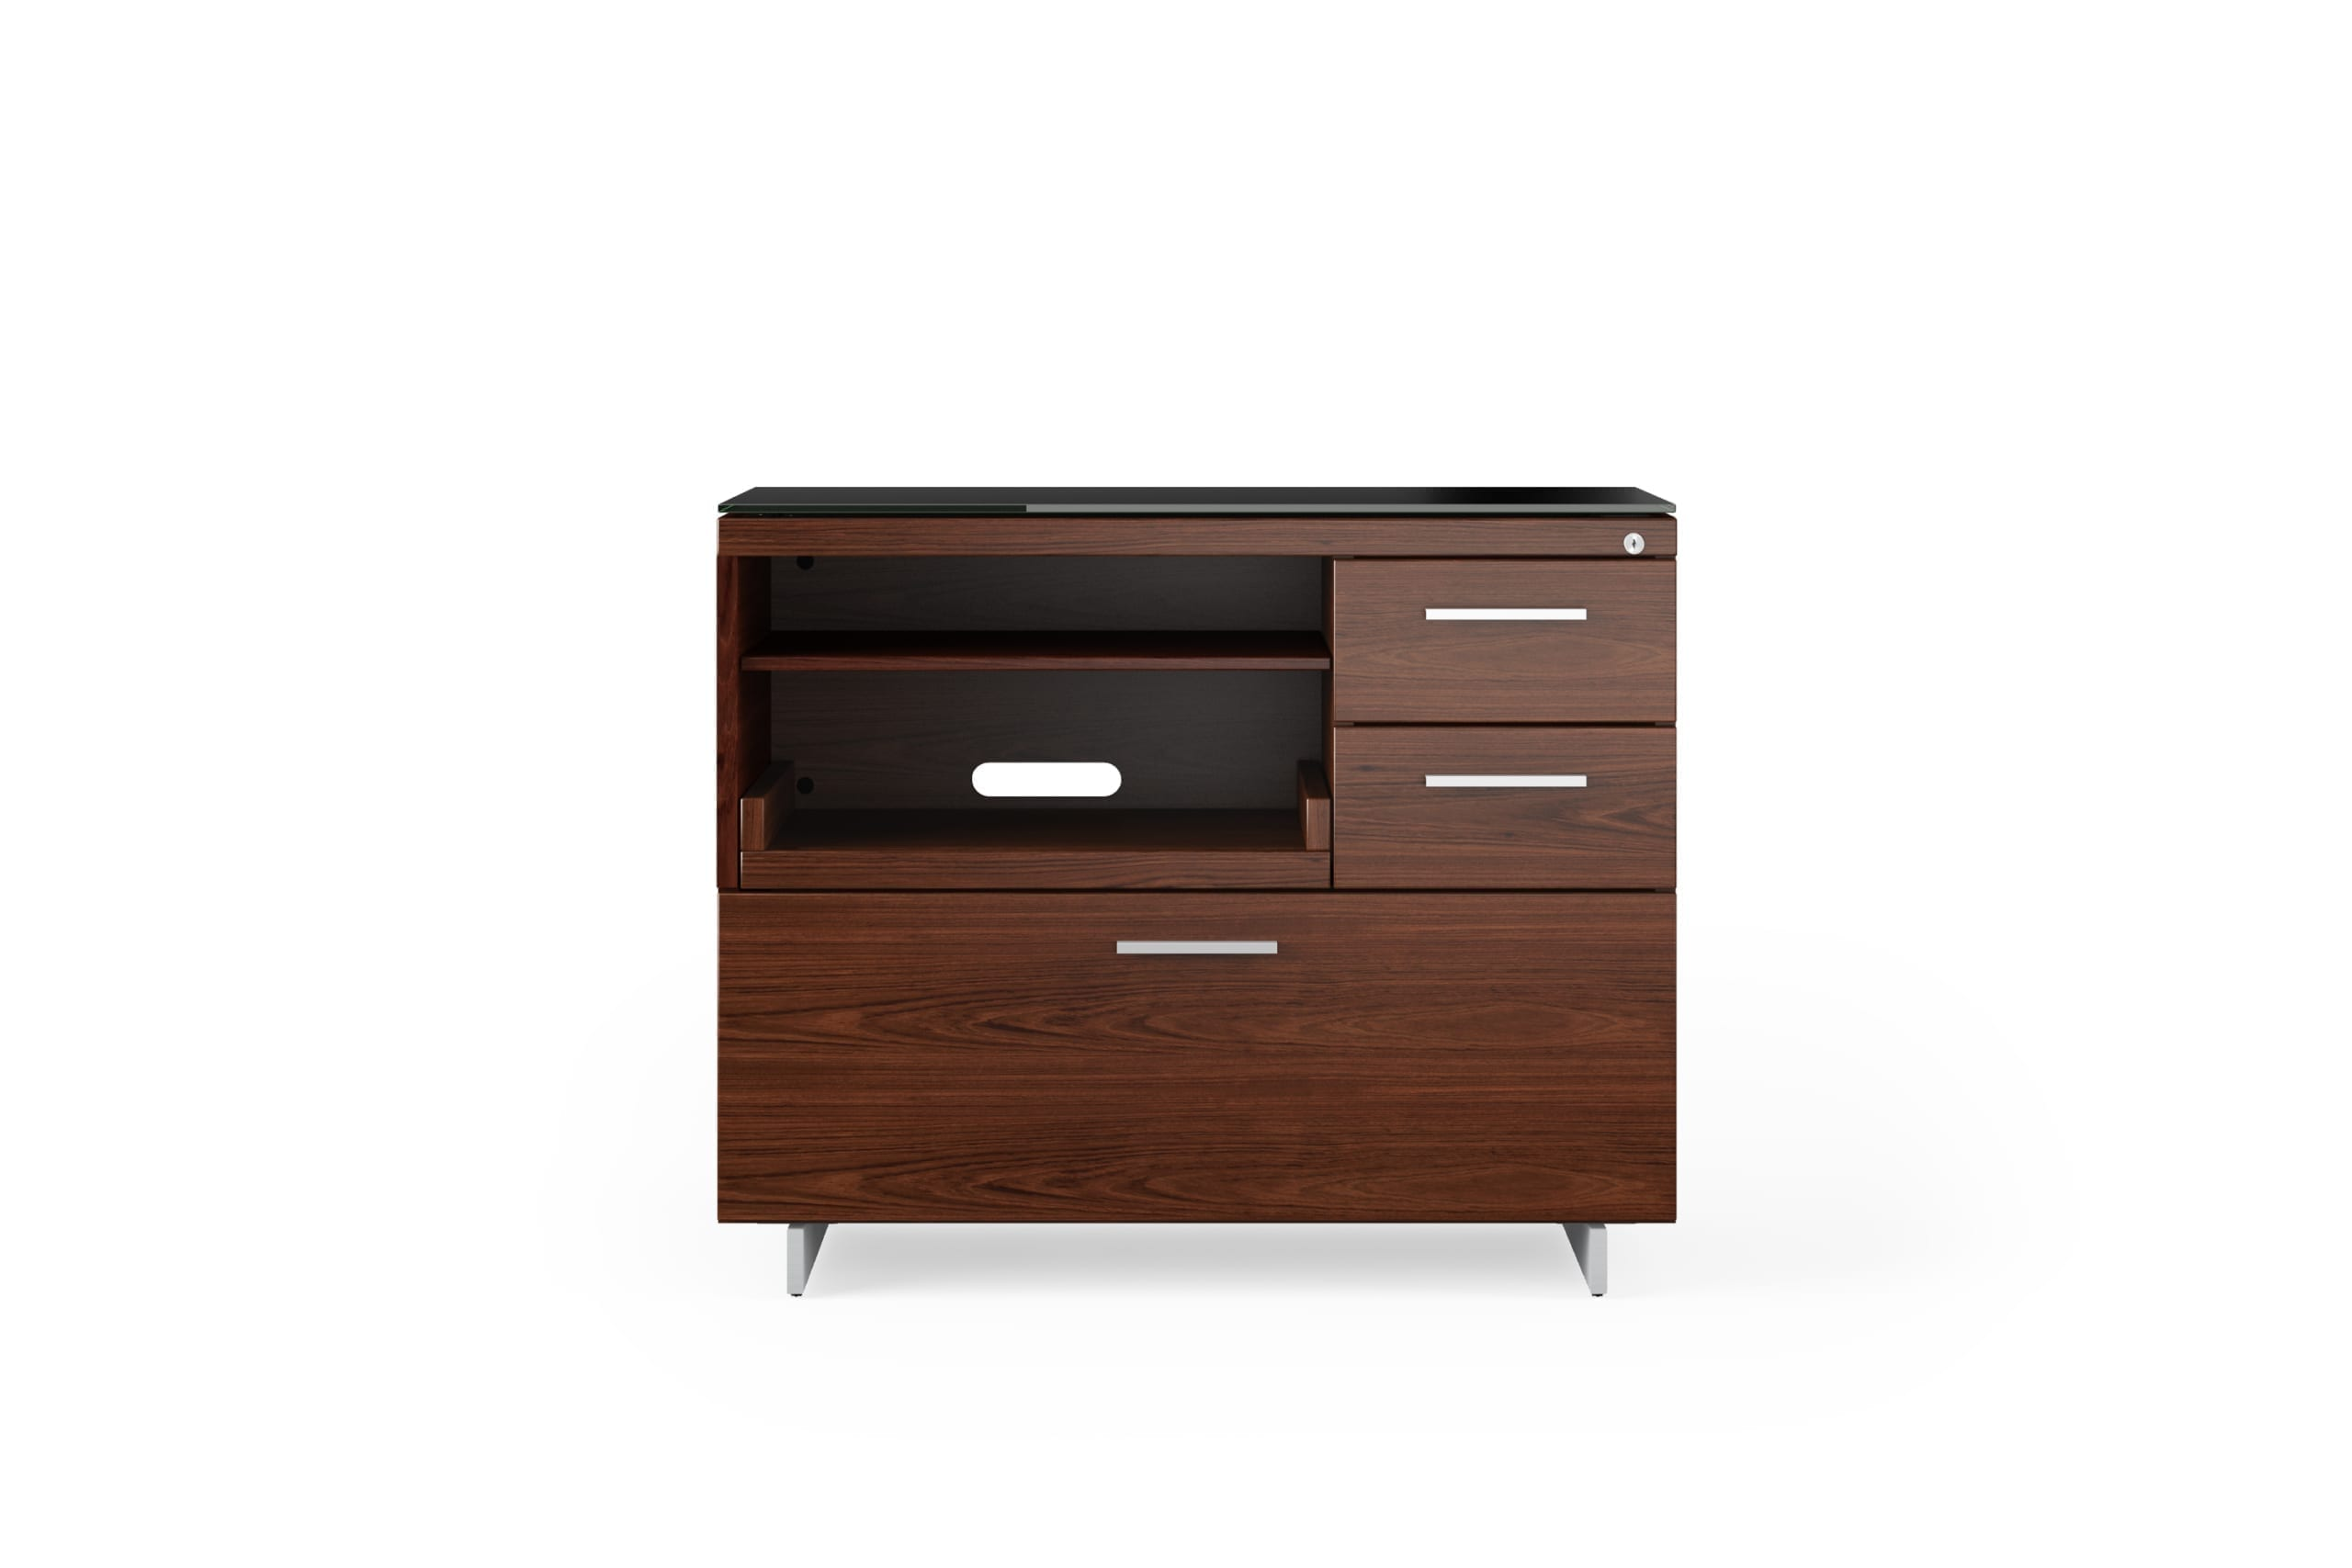 Sequel 6117 Multifunction Storage & Printer Cabinet CWL SN 1